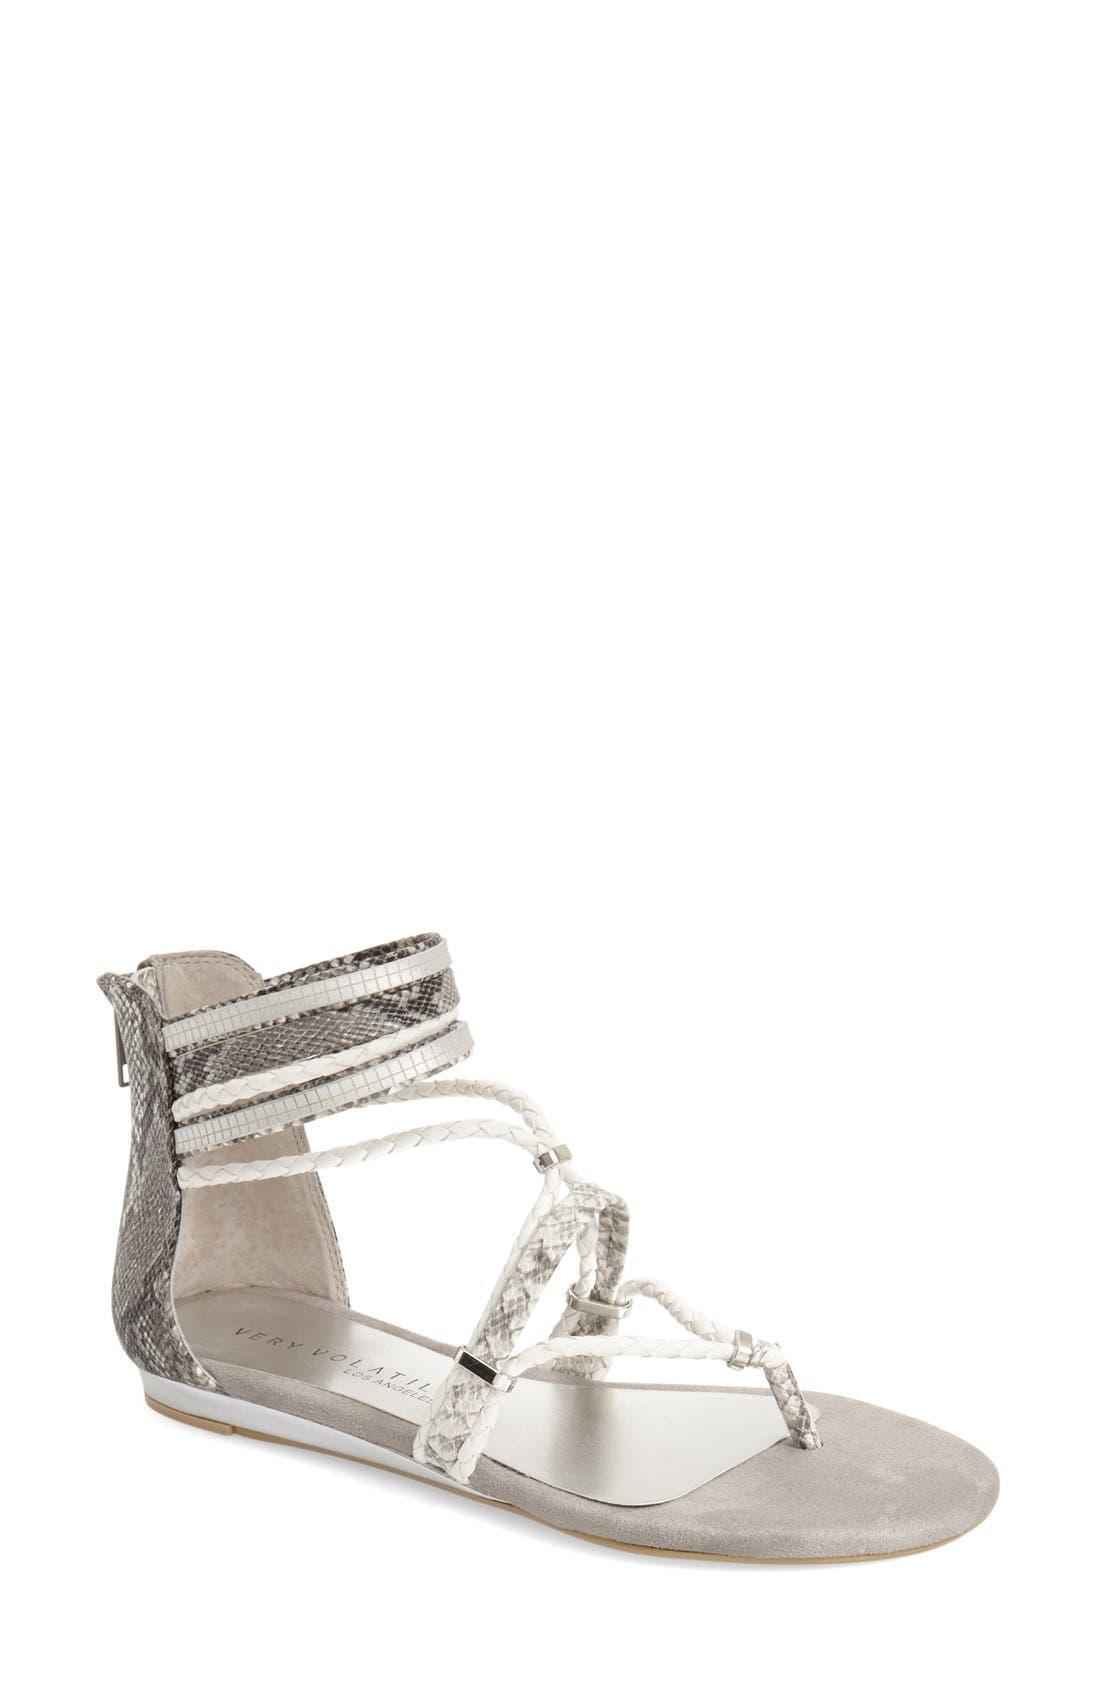 Alternate Image 1 Selected - Very Volatile 'Larissa' Sandal (Women)